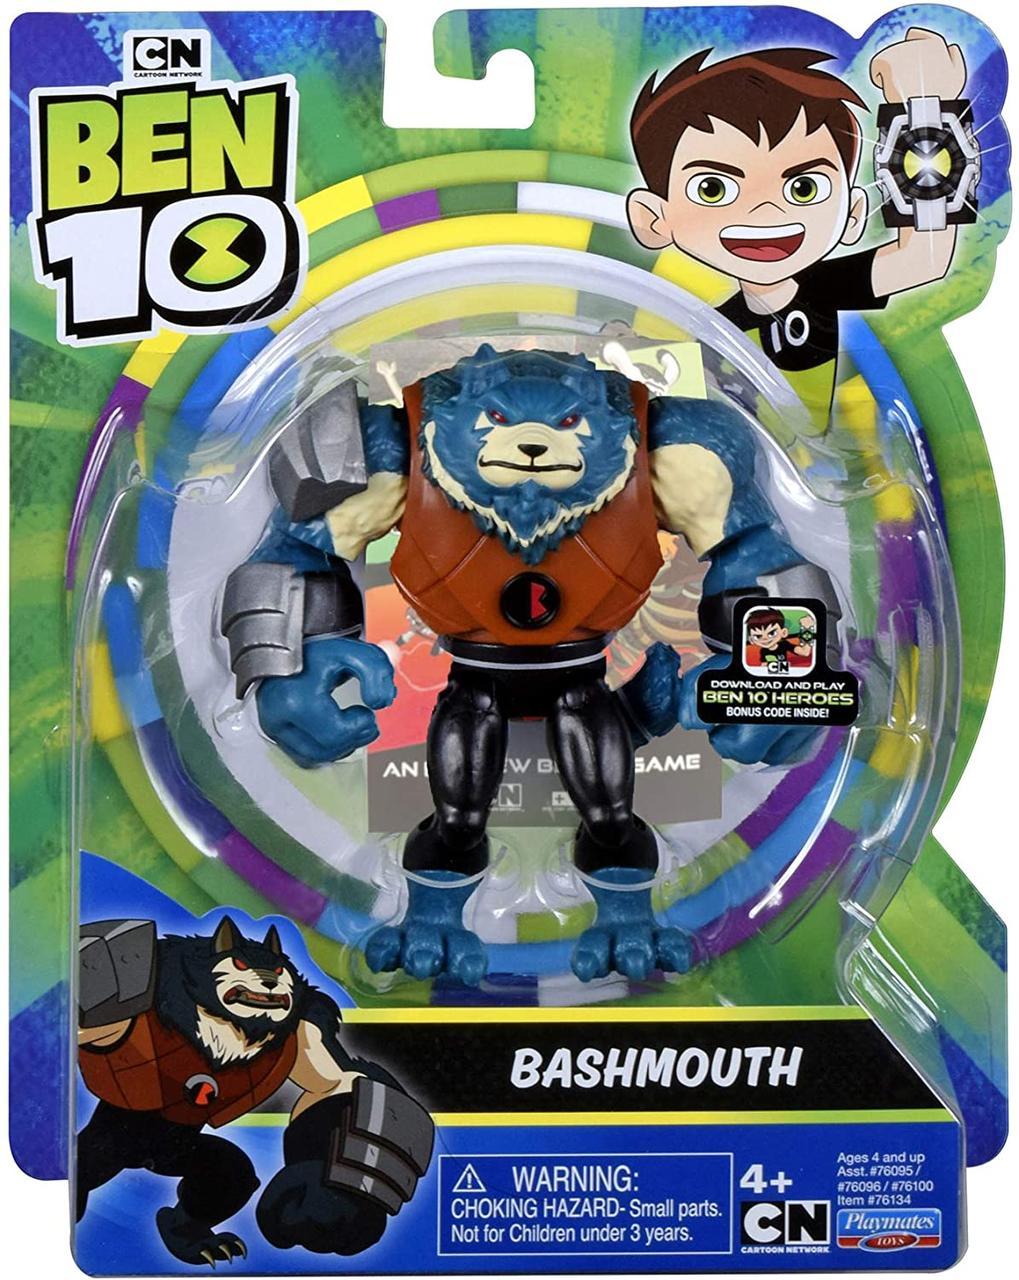 Фігурка Бен 10 Бен 10 Bashmouth Оригінал з США